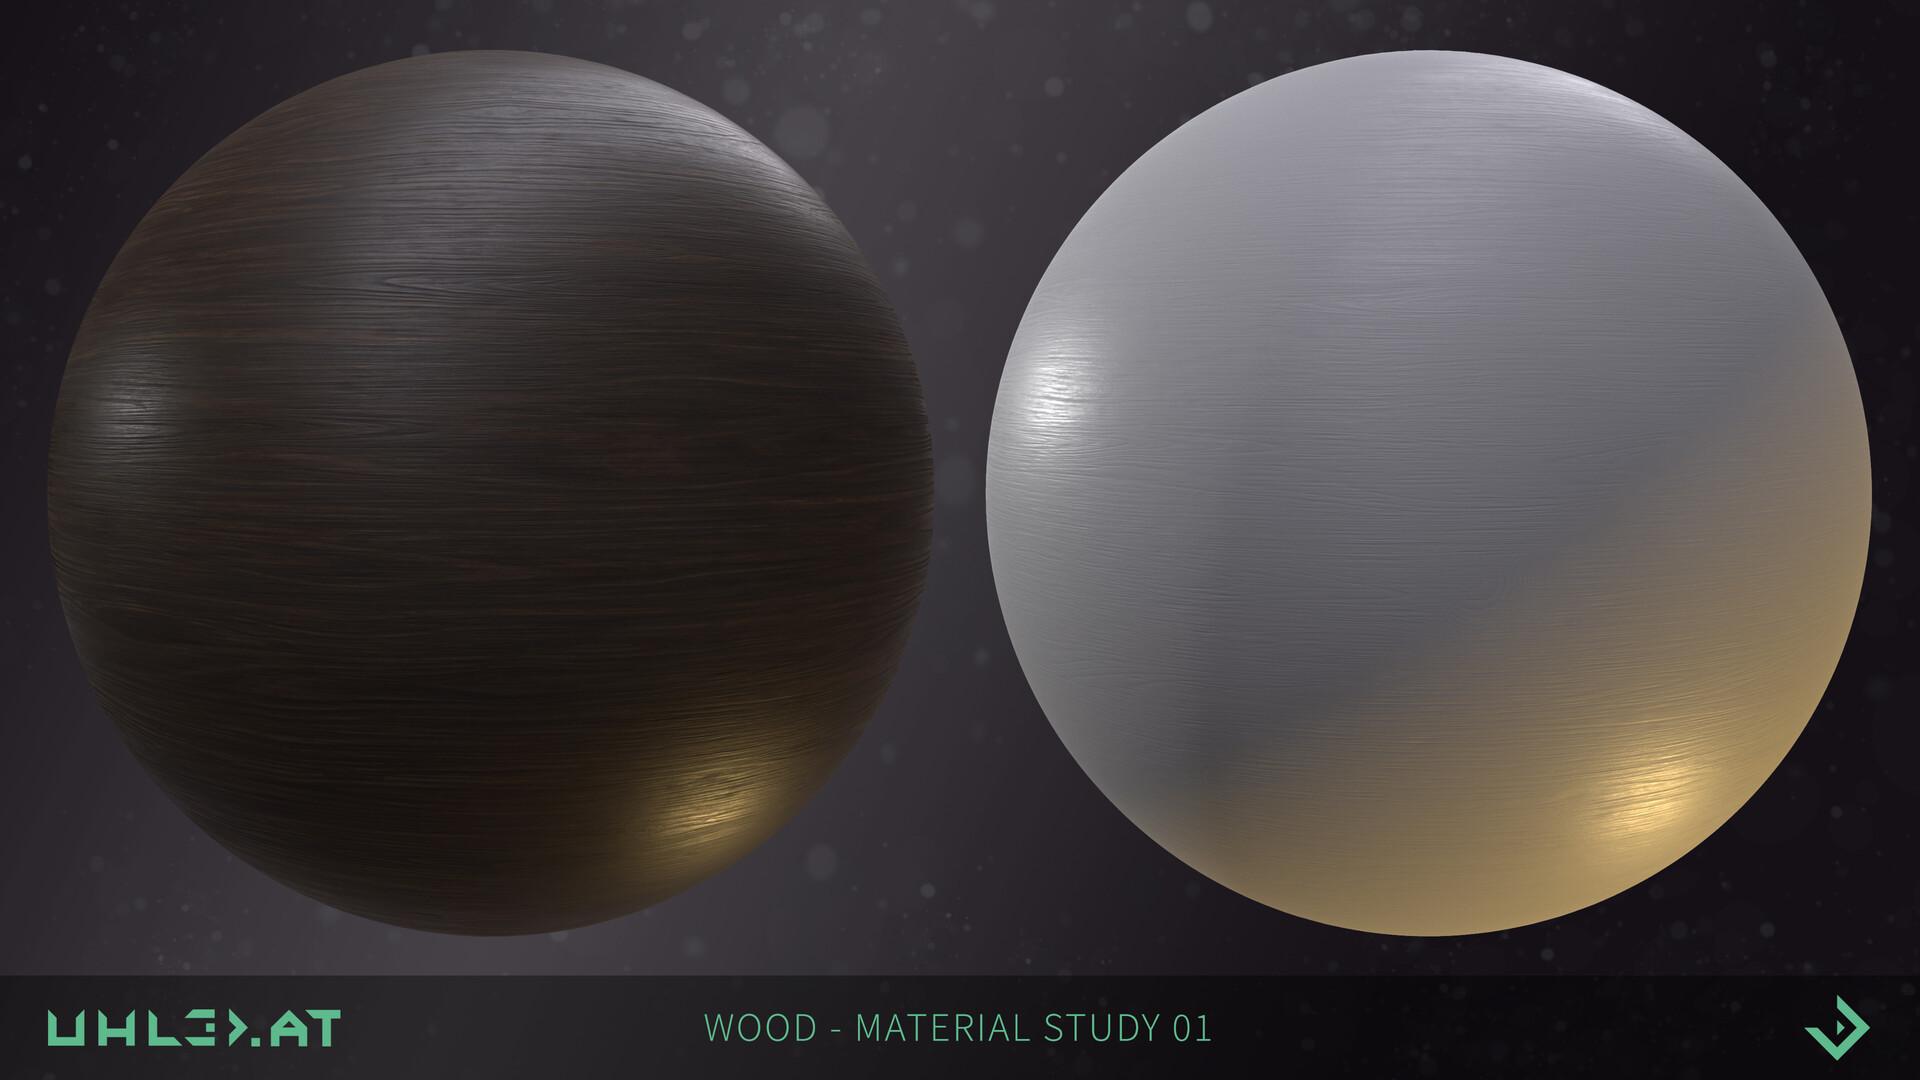 Dominik uhl wood study v1 01